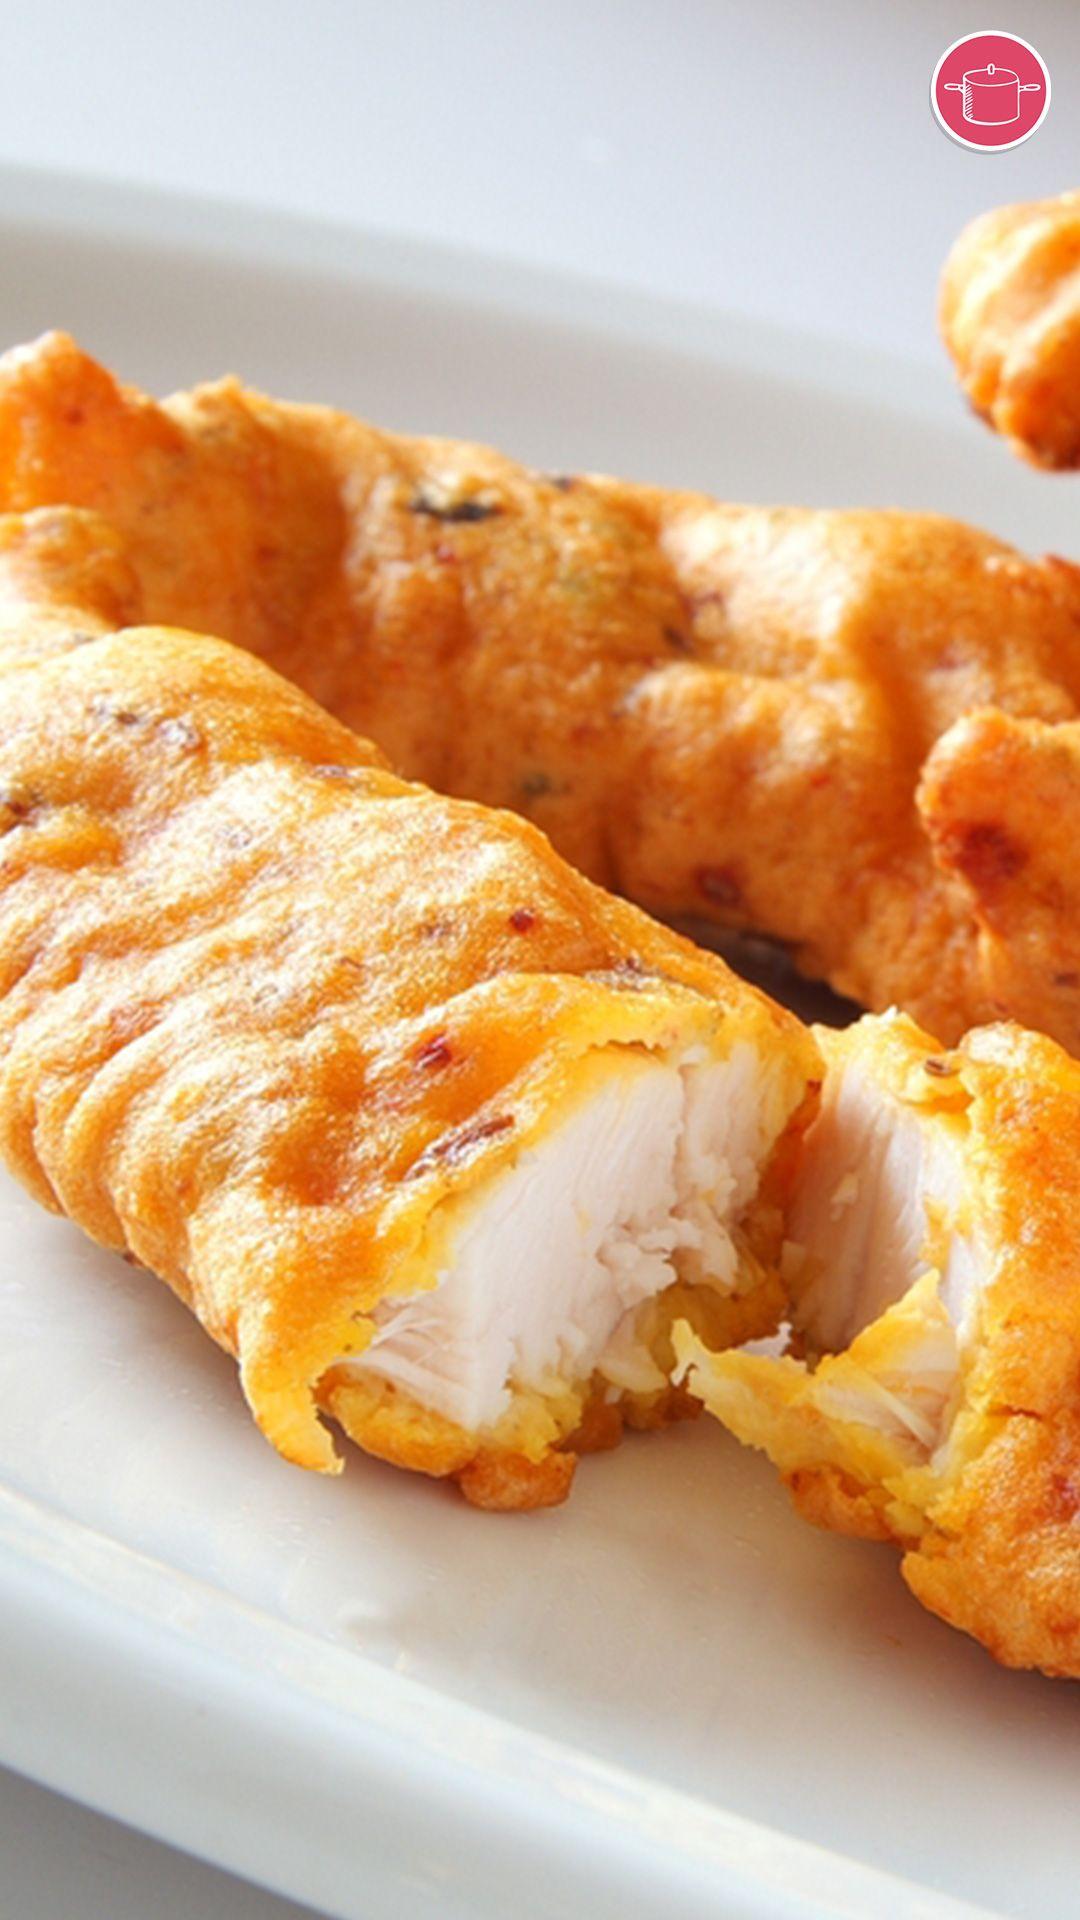 تمبورا الدجاج Recipe In 2021 Recipes